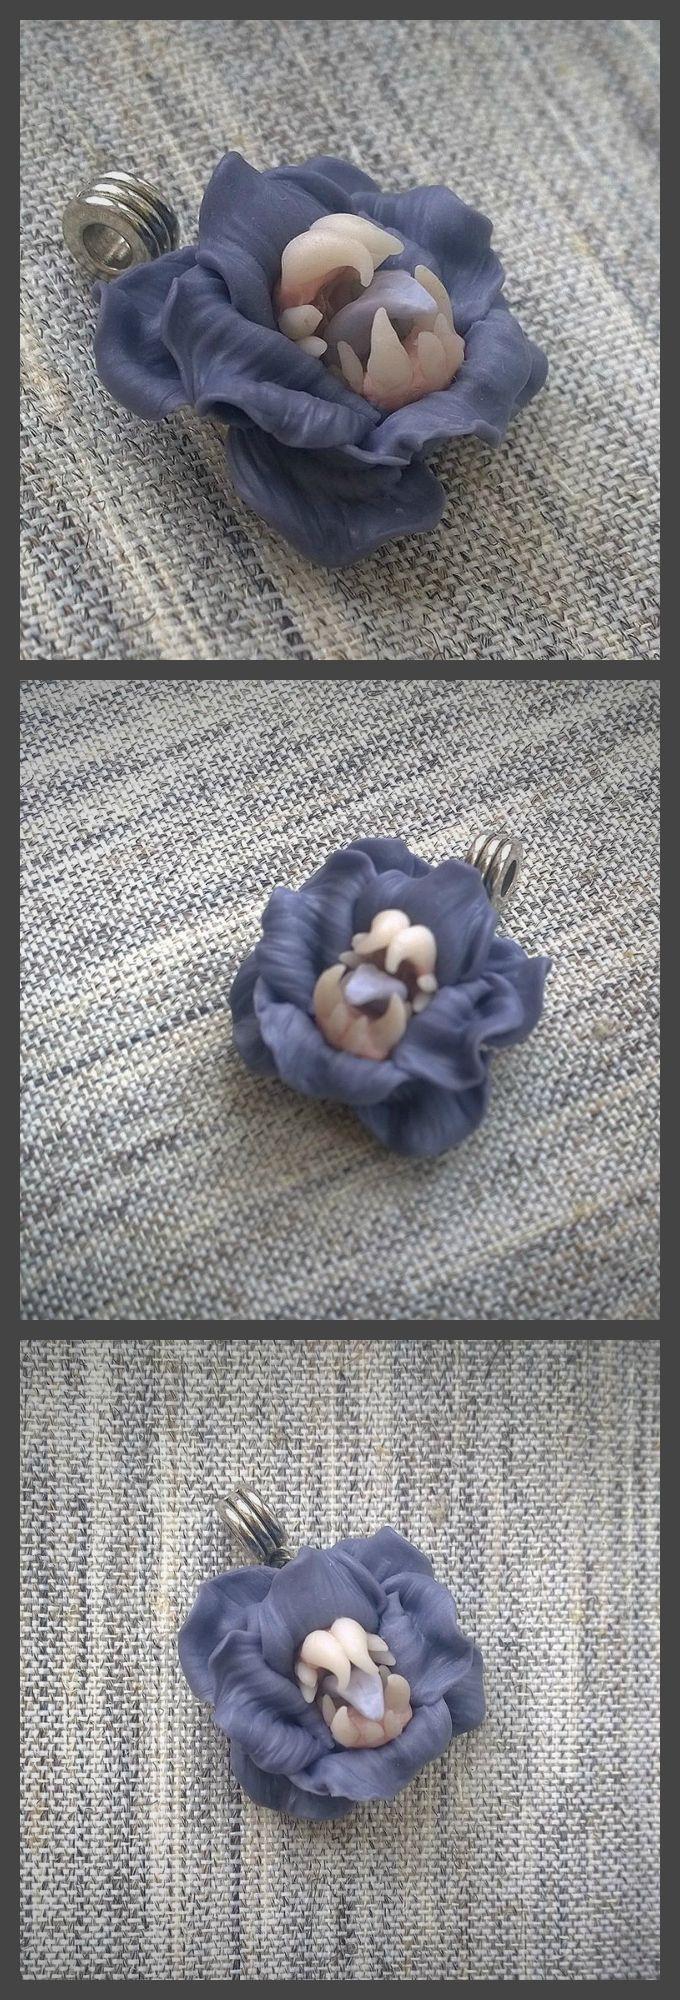 #etsy #flowers #polymerclay #полимернаяглина #хобби #ручнаяработа #polymerclay #fimo #premo #sculpey #etsy  #handmade #зубоцвет #jewelry #silverushka